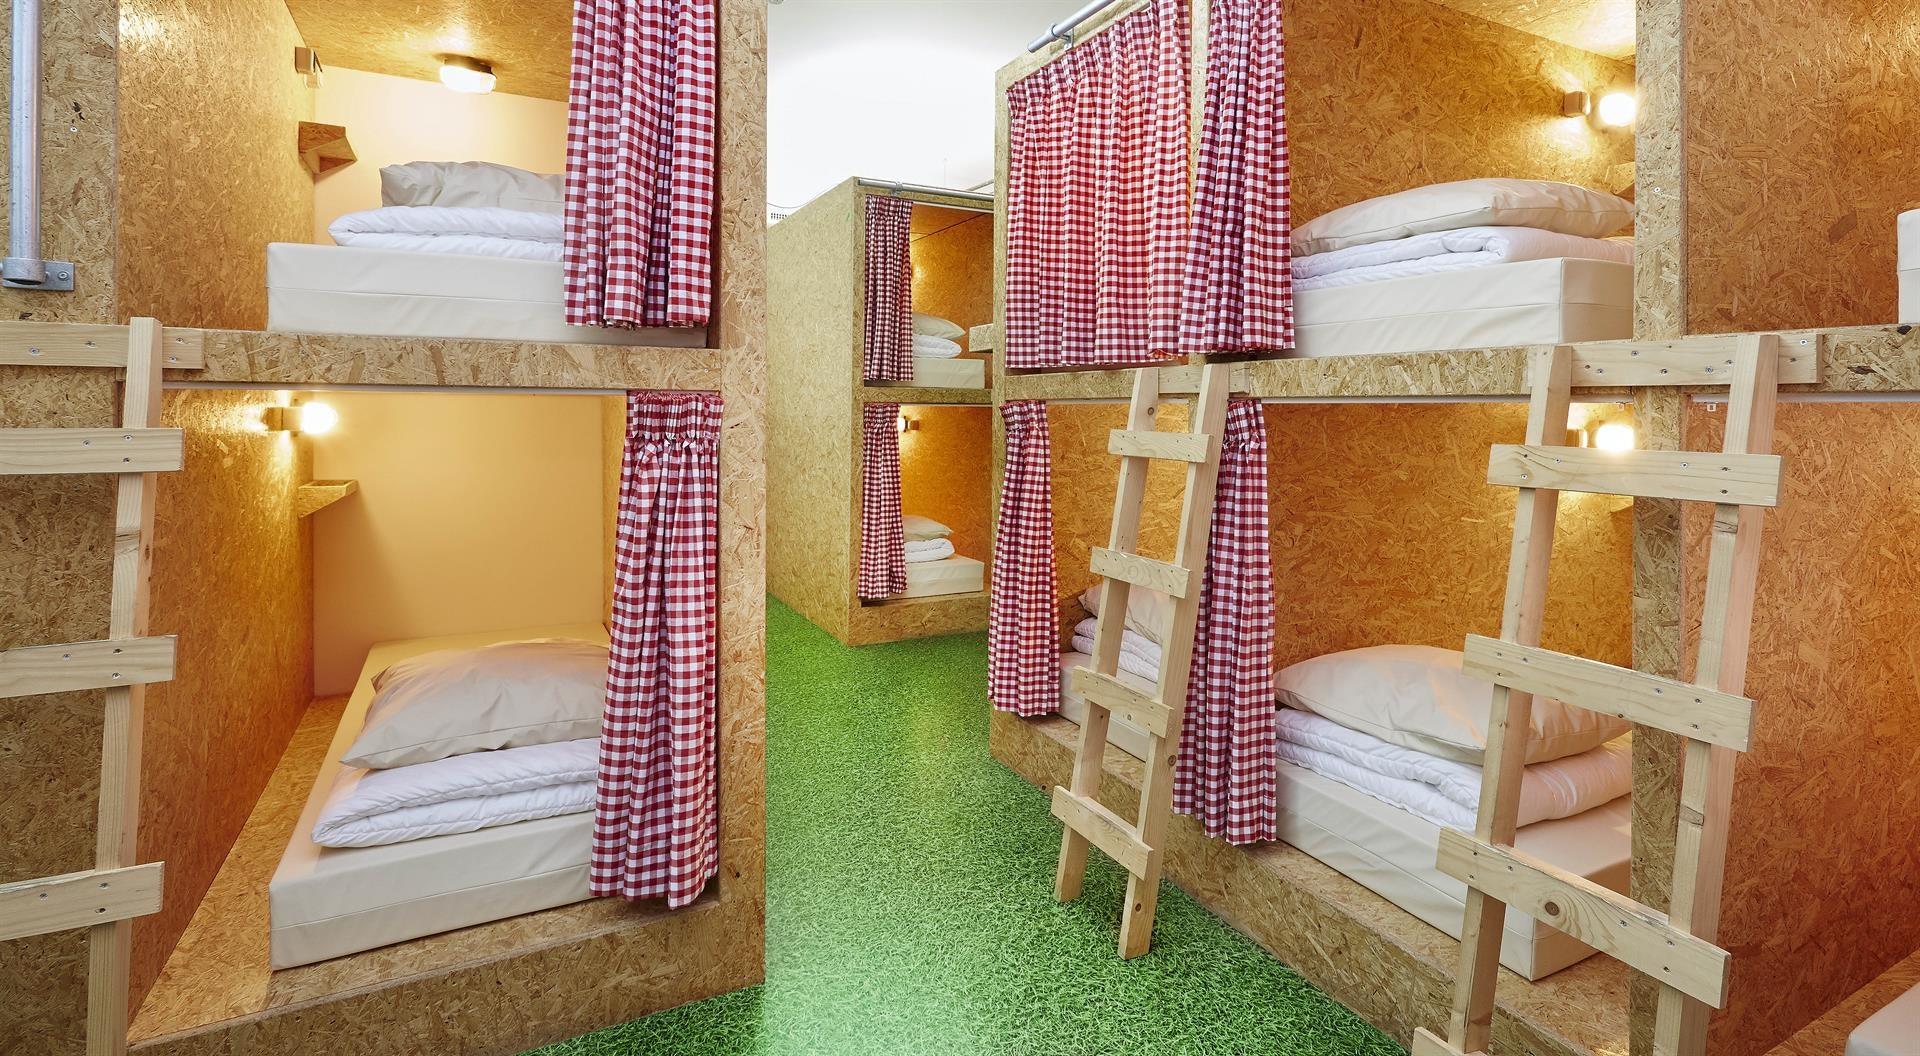 a dorm at Kingkool Hostel in The Hague